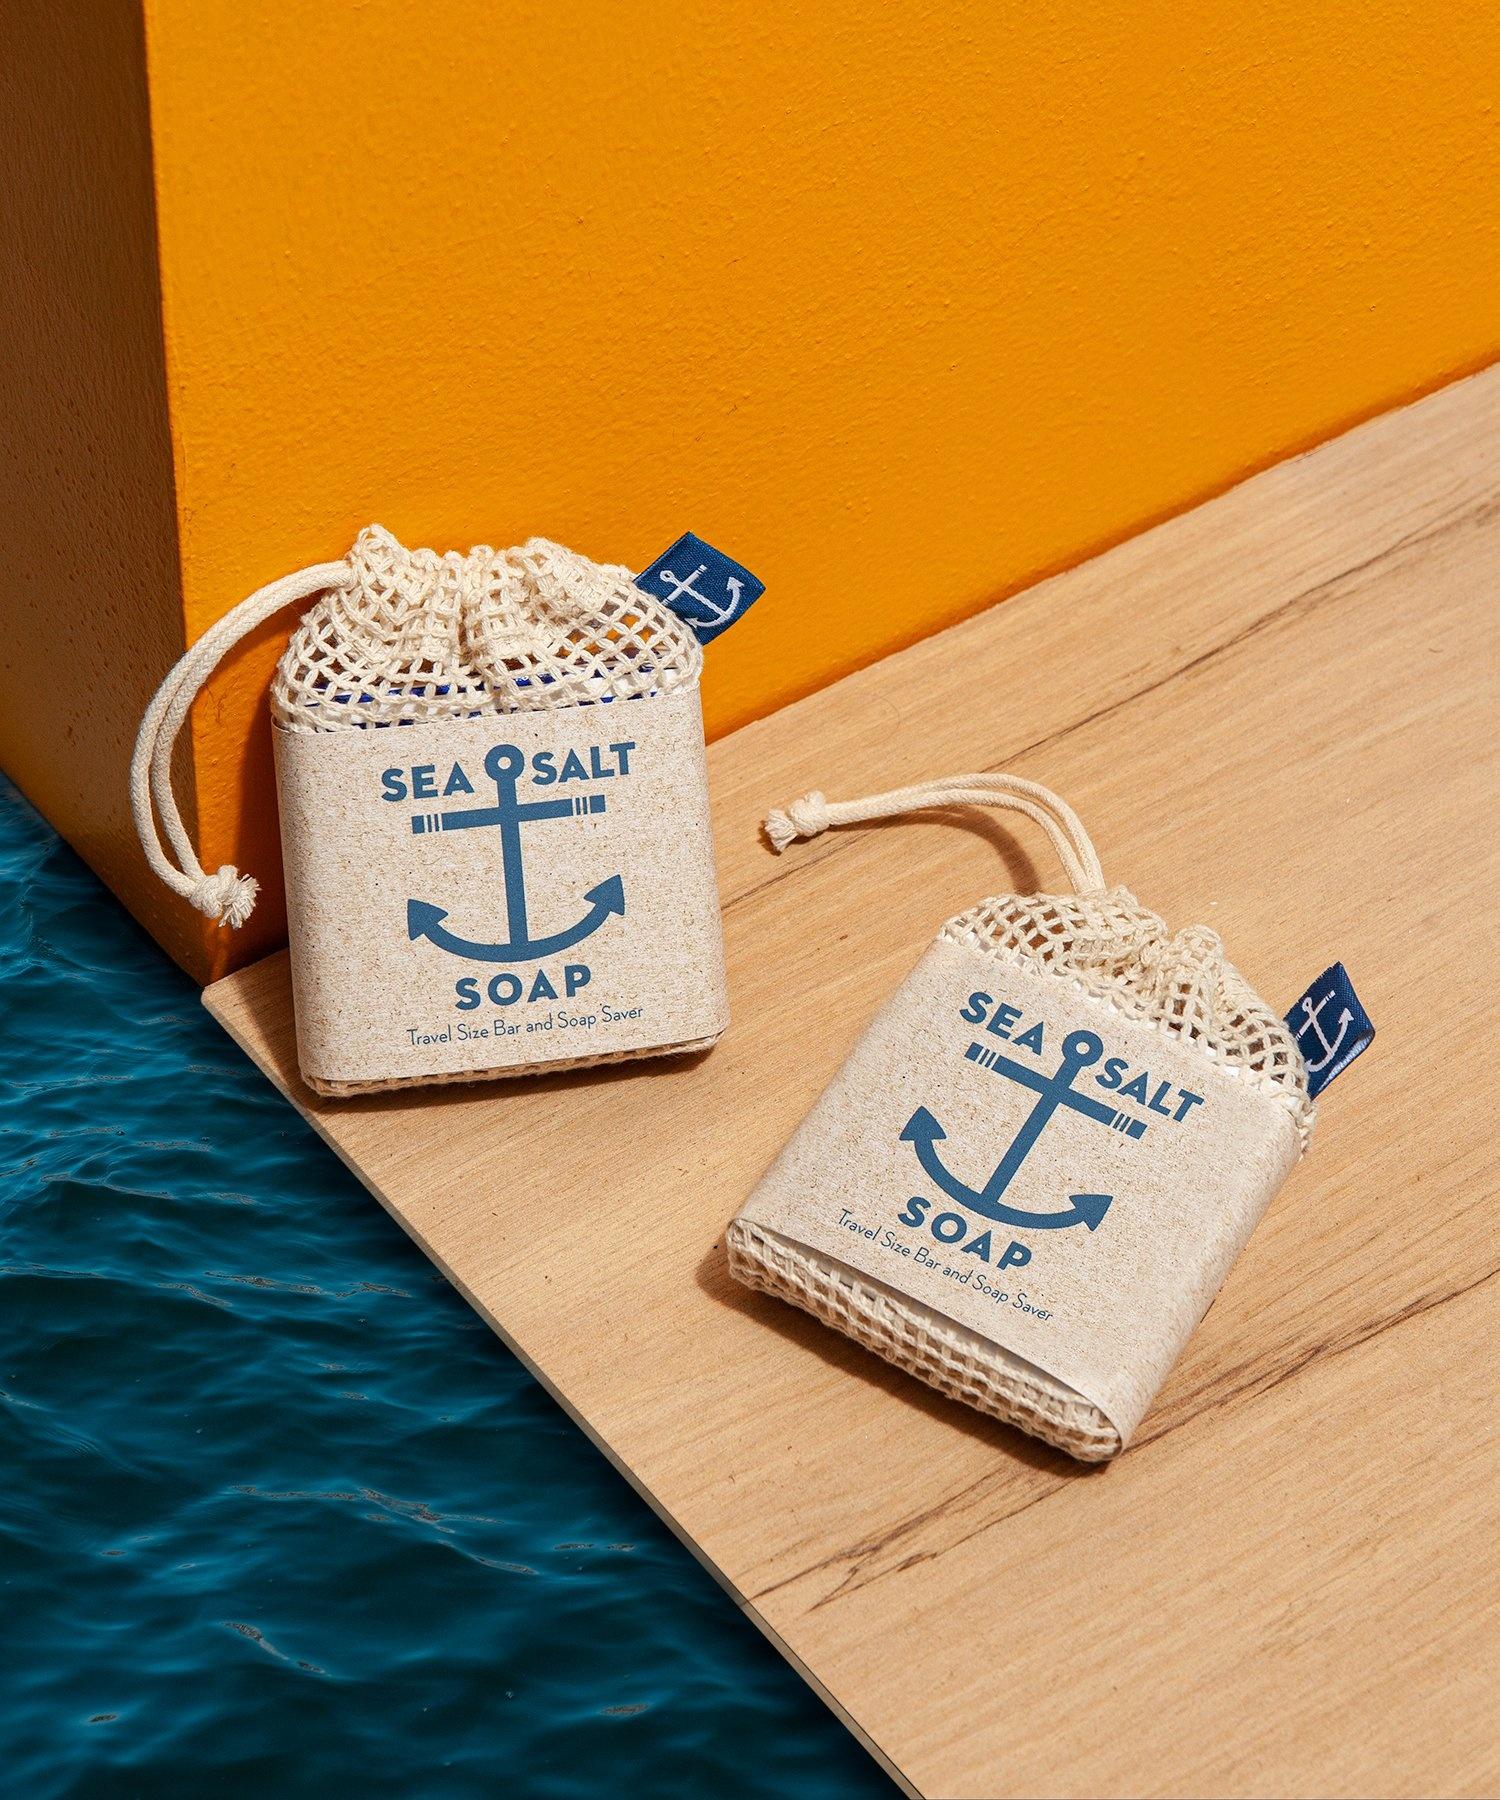 Swedish Dream - Sea Salt Soap Travel Size Bar & Bag-2